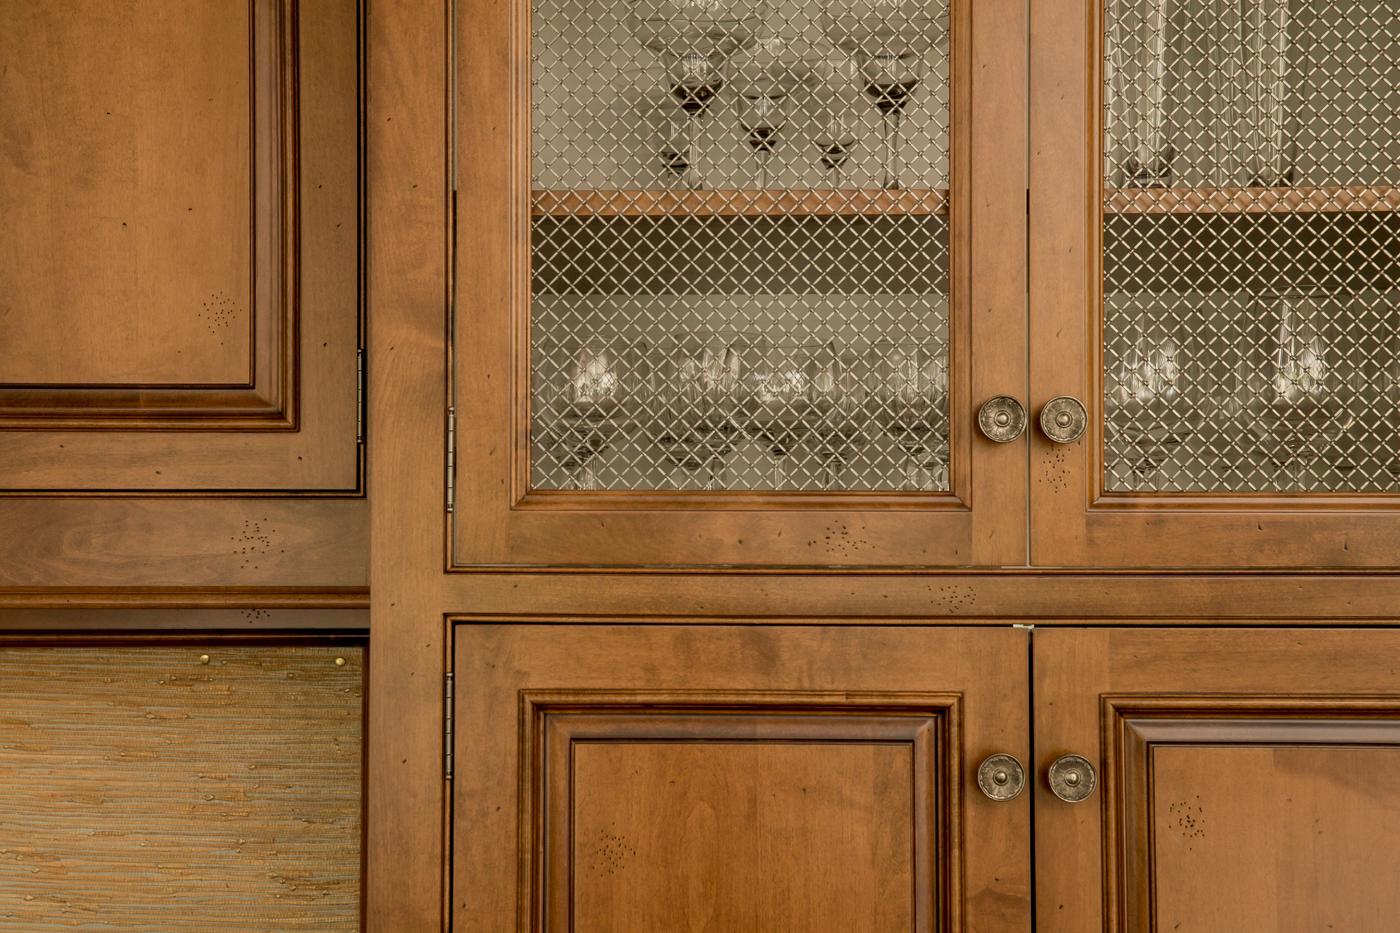 nutmeg Stained Maple Kitchen Cabinet Door